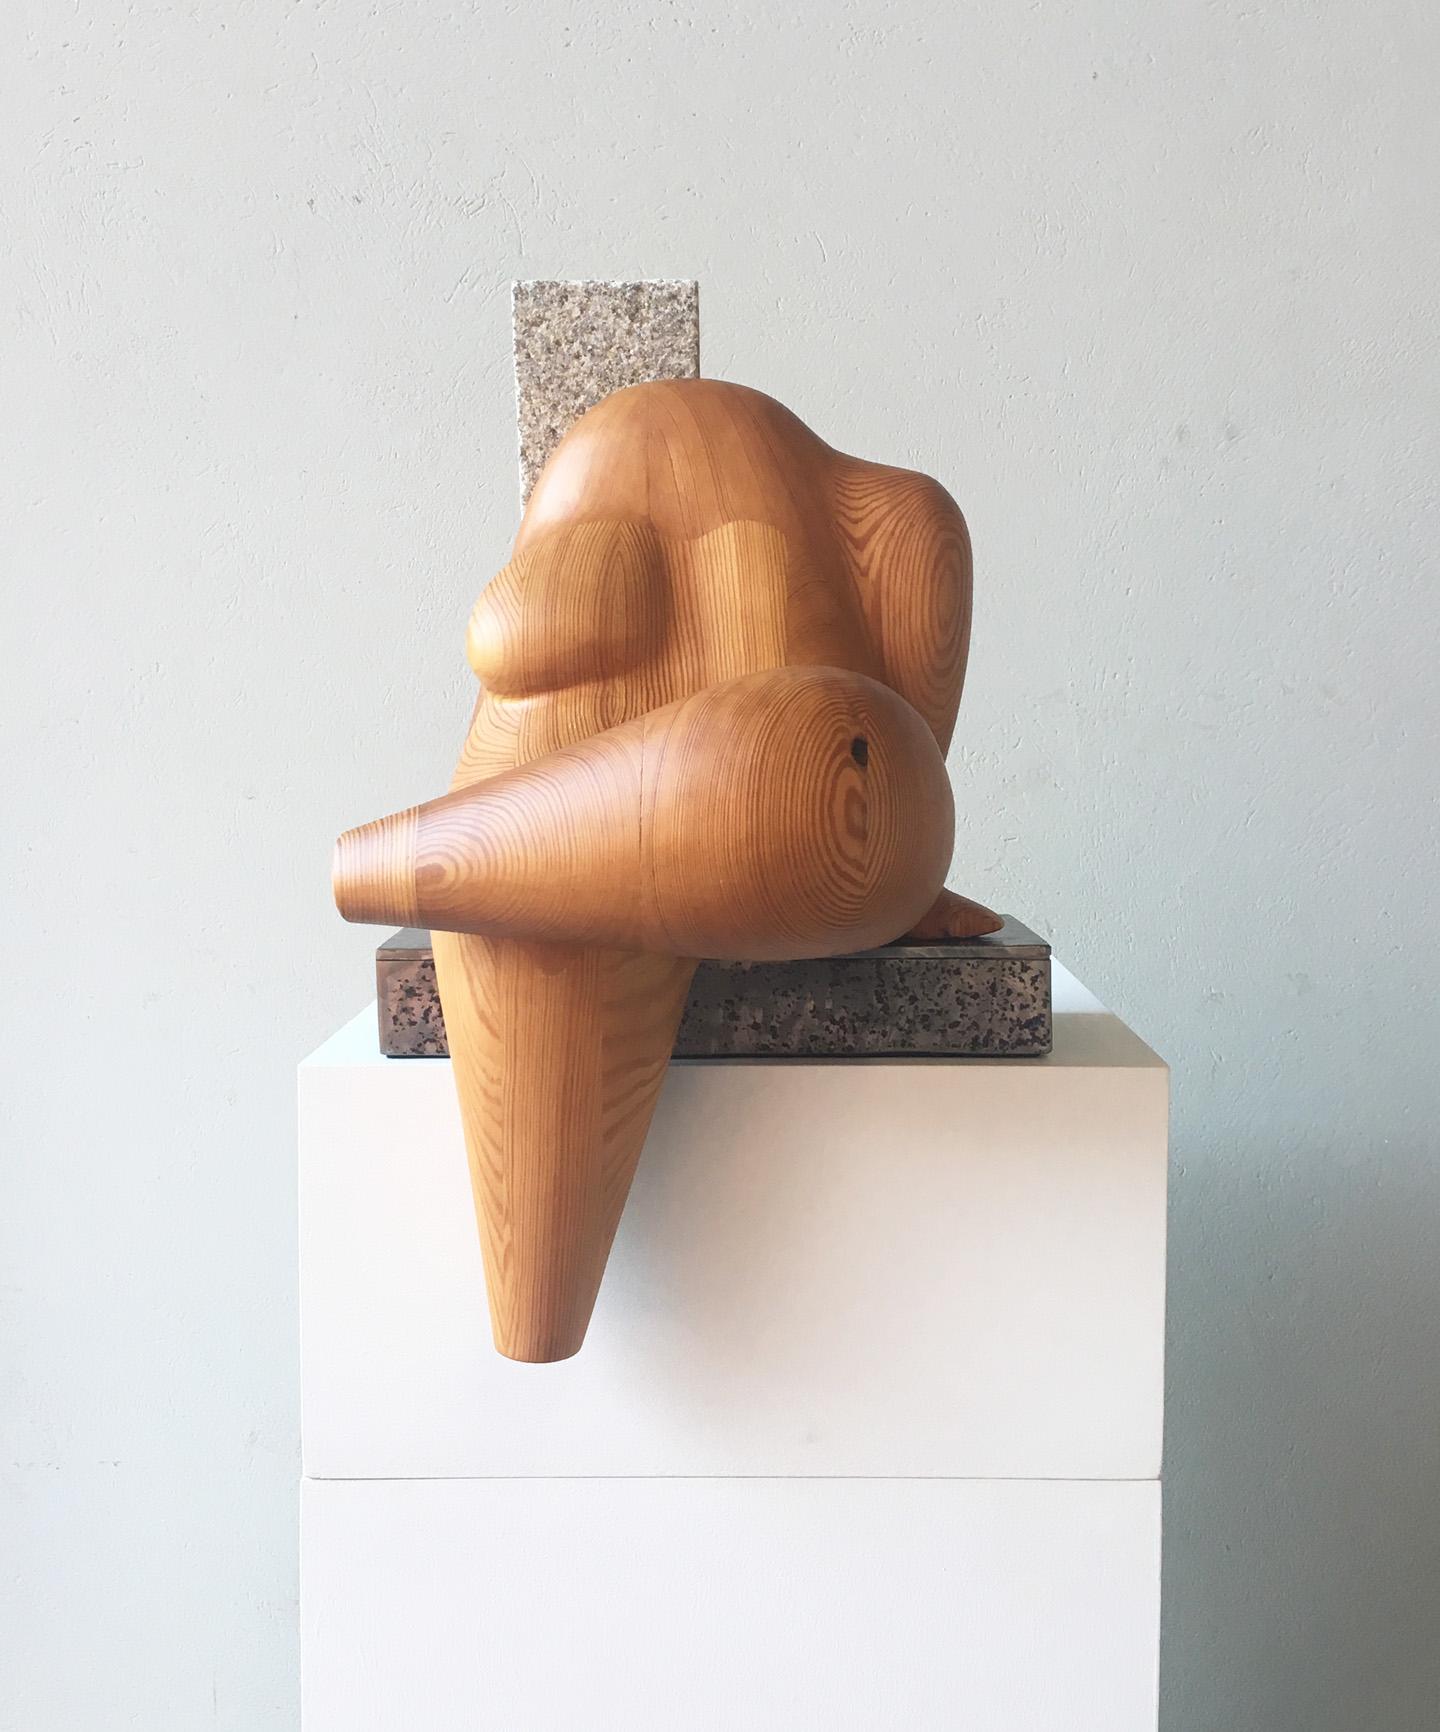 Mujer_5 (2018) - Juan Silva - Juansilva_escultor